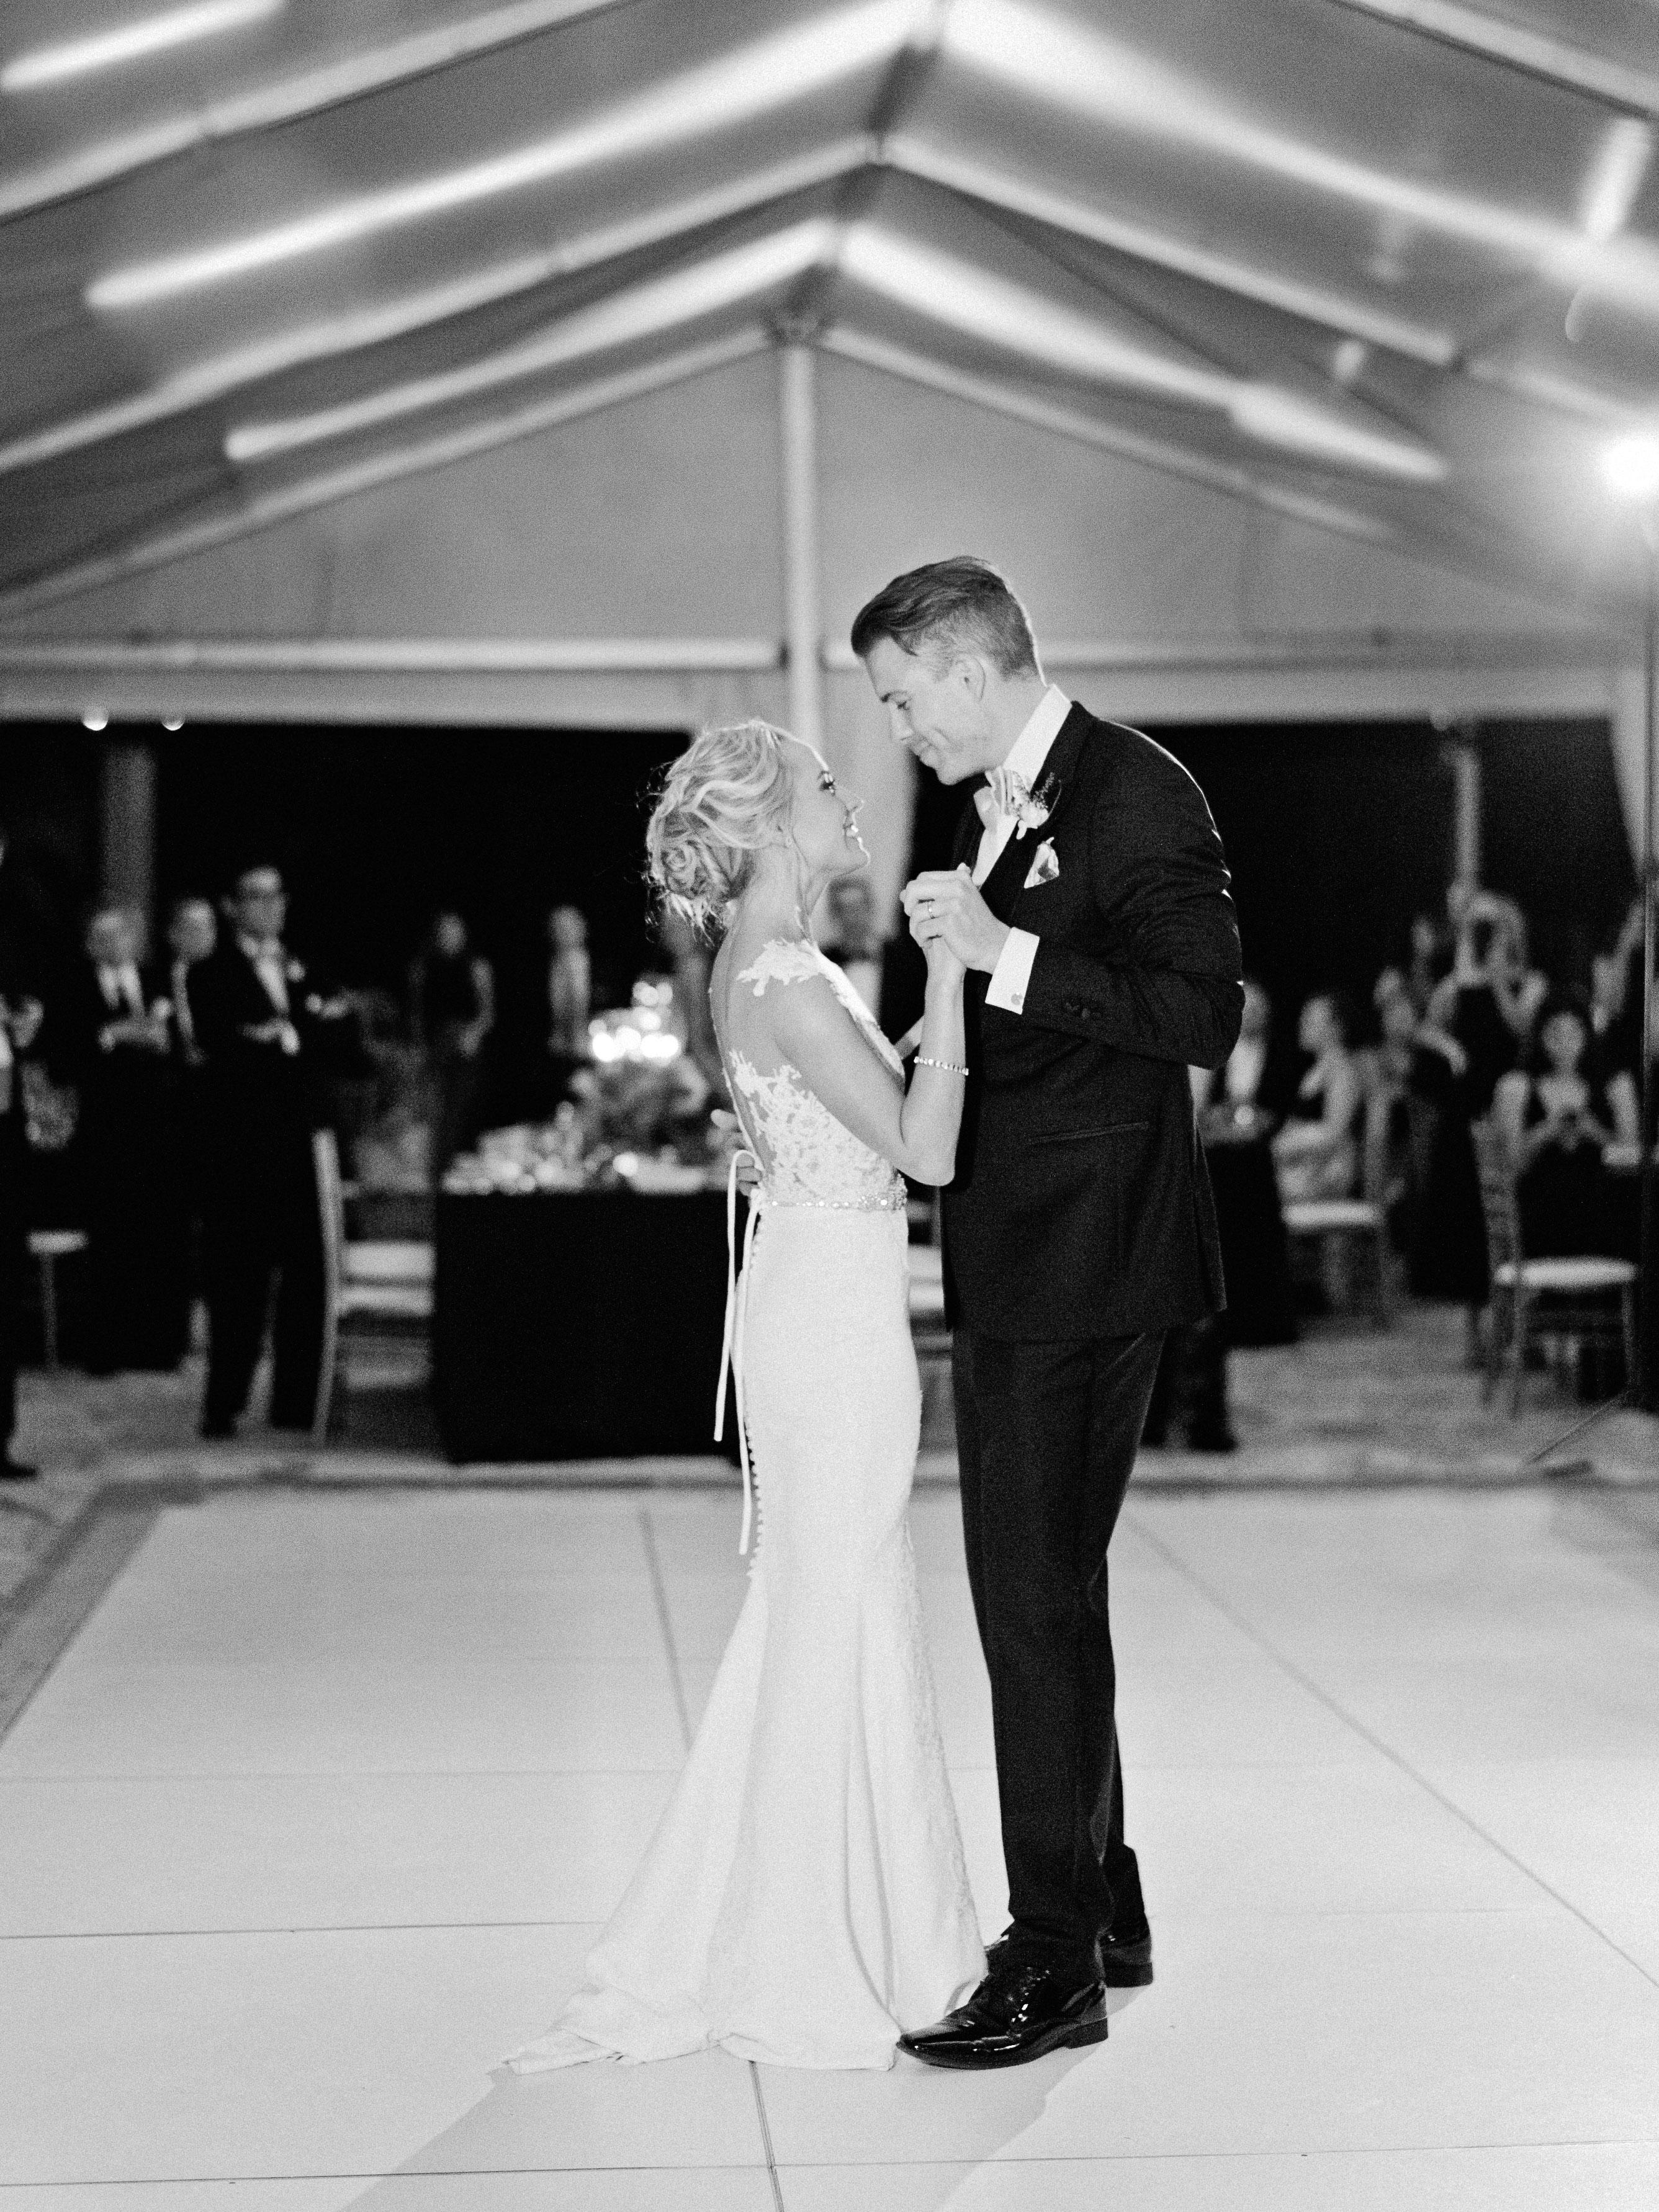 brette patrick wedding first dance